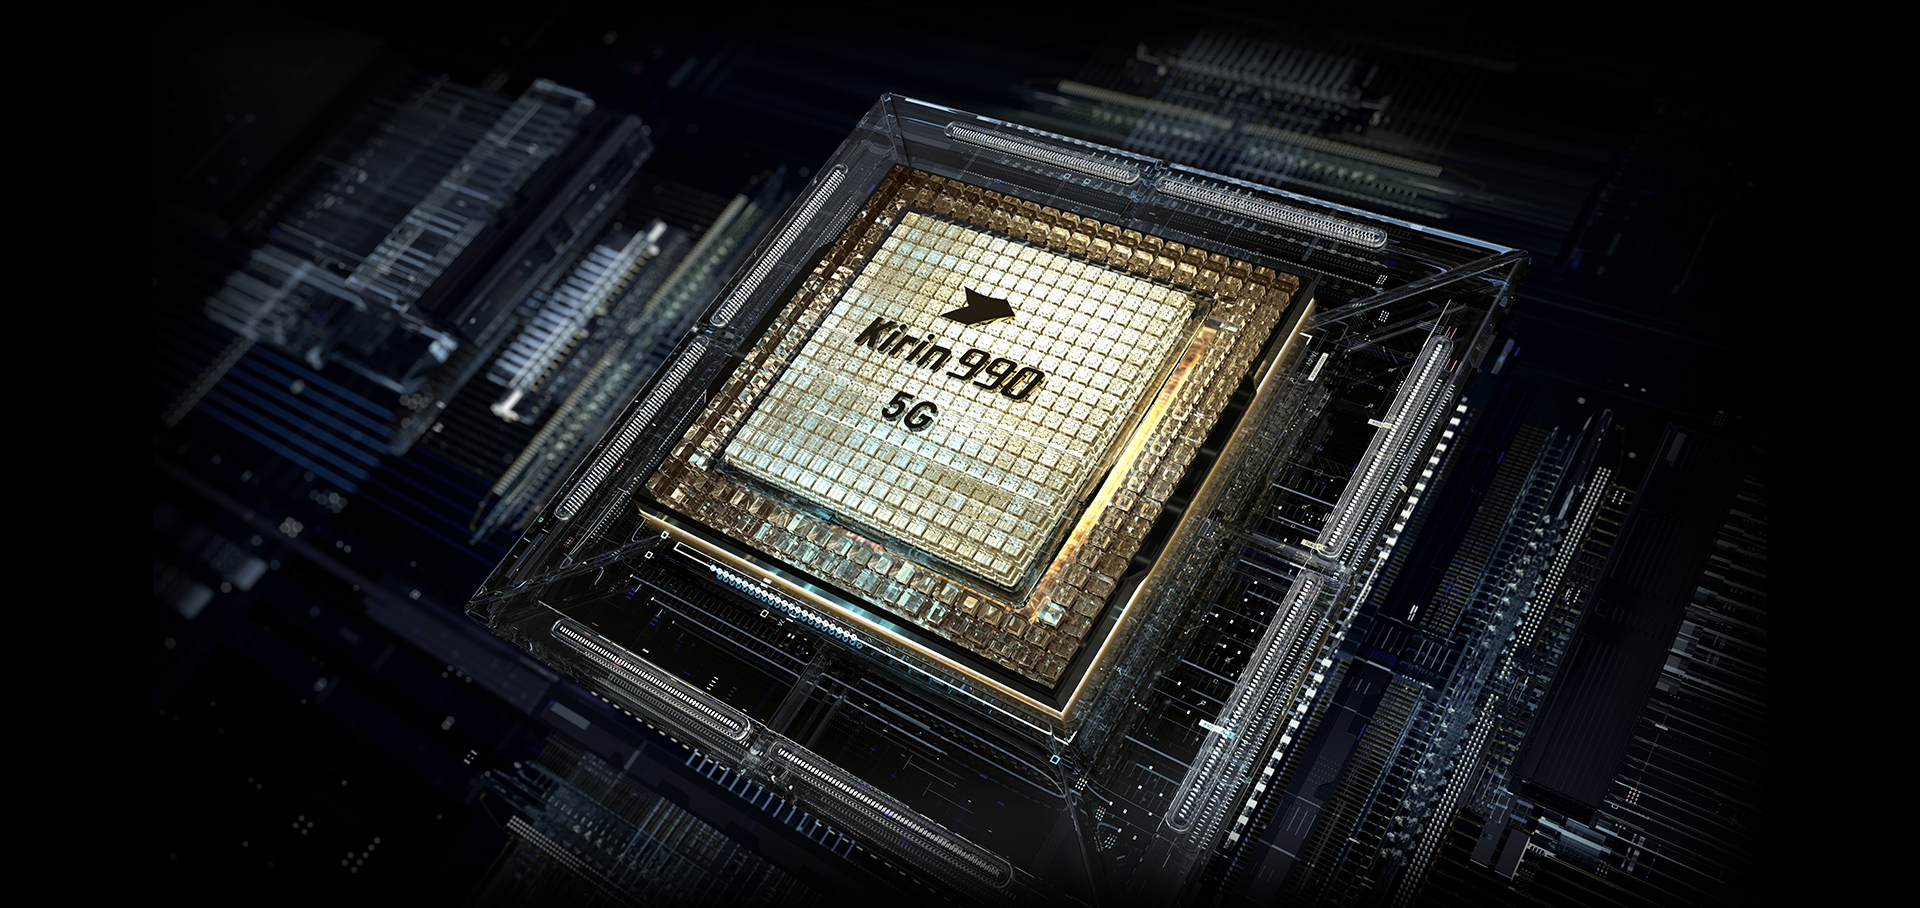 PORSCHE DESIGN HUAWEI Mate 30 RS 5G Chipset Experience